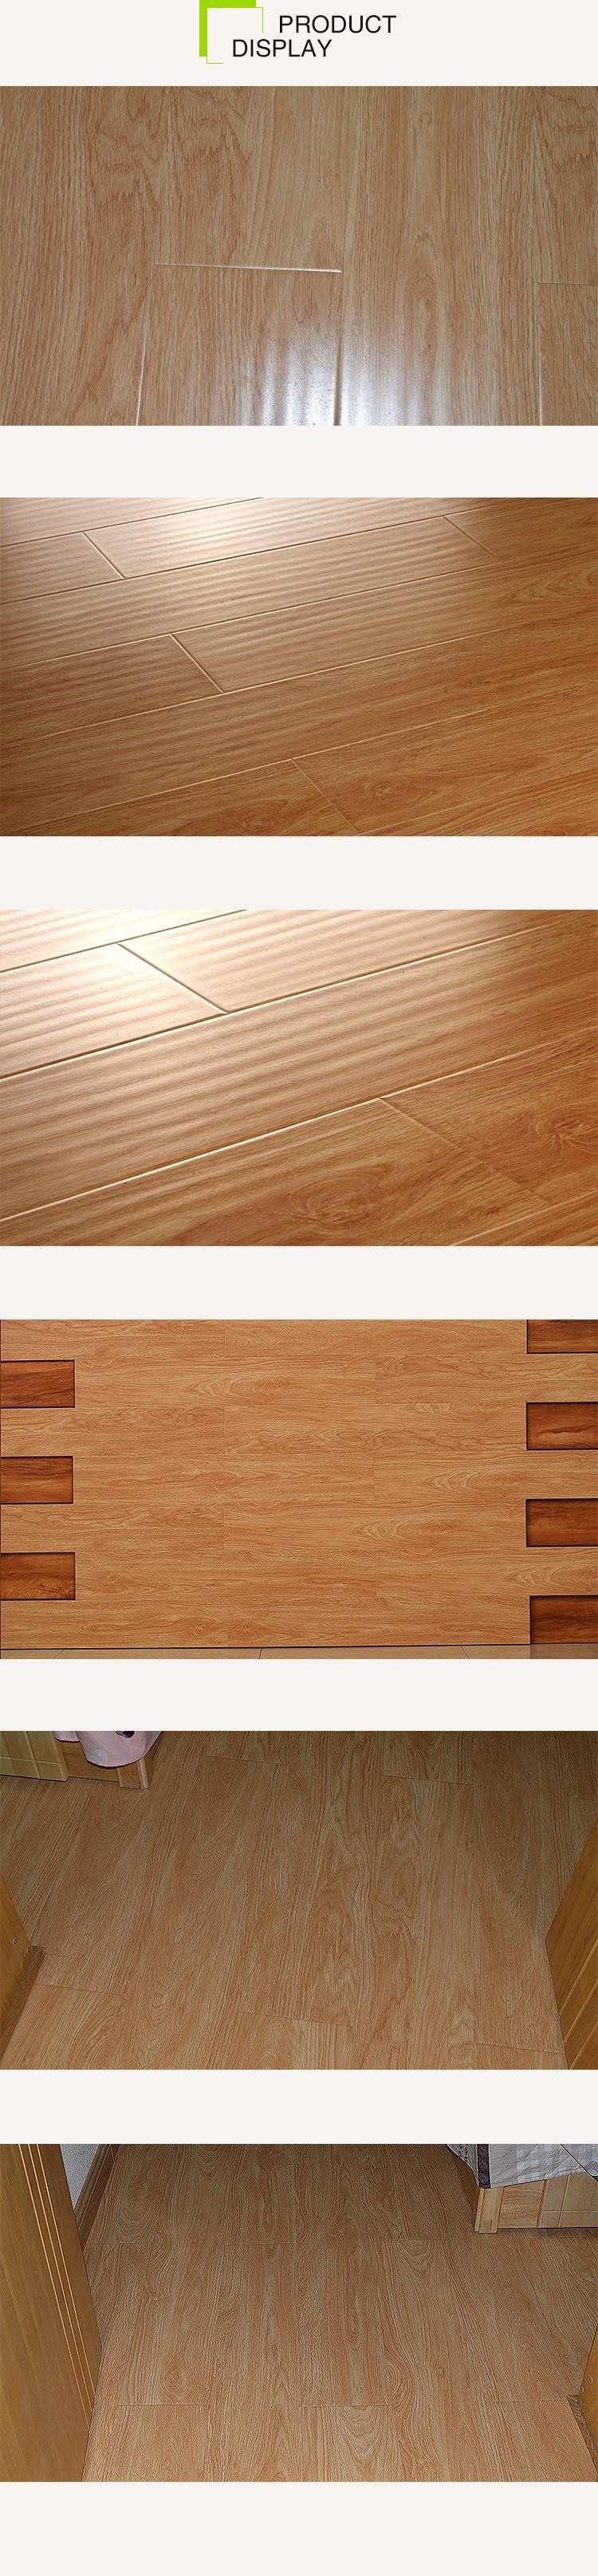 waterproof hardwood flooring of 30 unique plastic laminate flooring swansonsfuneralhomes com for plastic laminate flooring awesome plastic laminate flooring pin by pixel • floors aa†